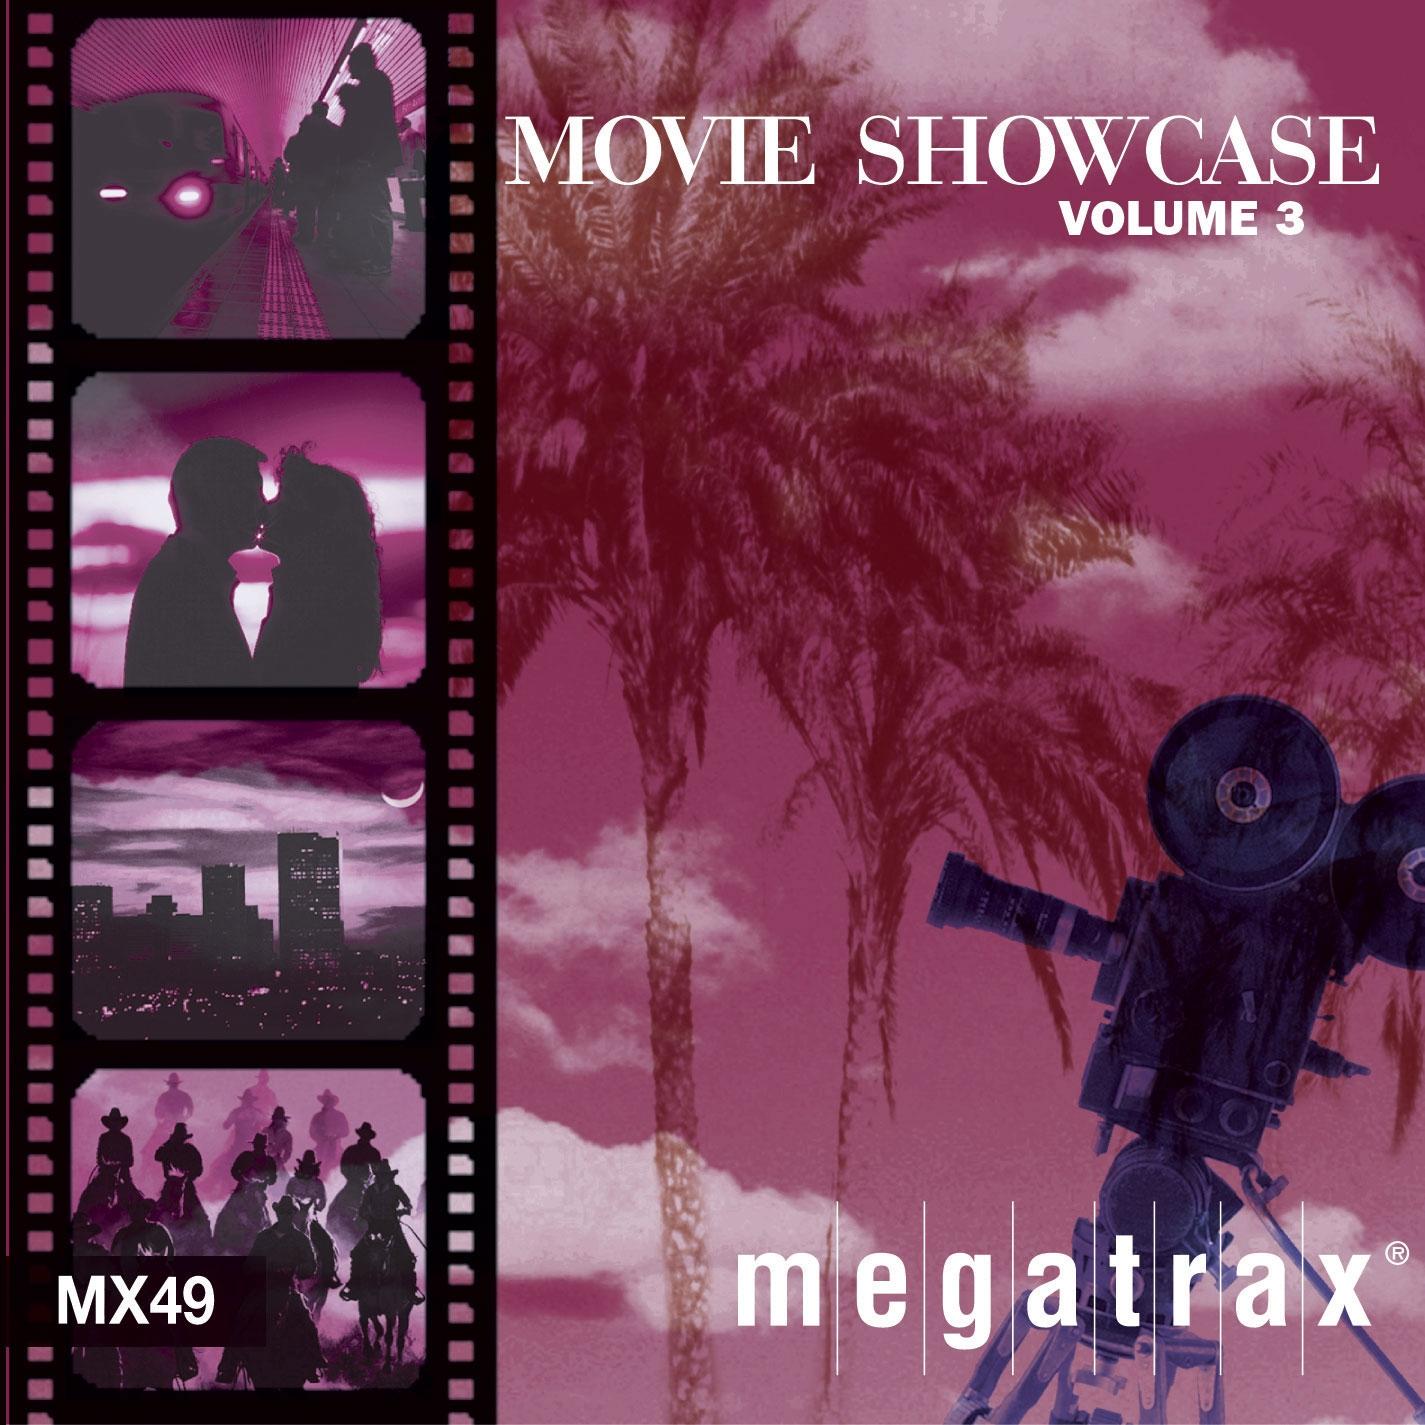 Movie Showcase Vol. 3